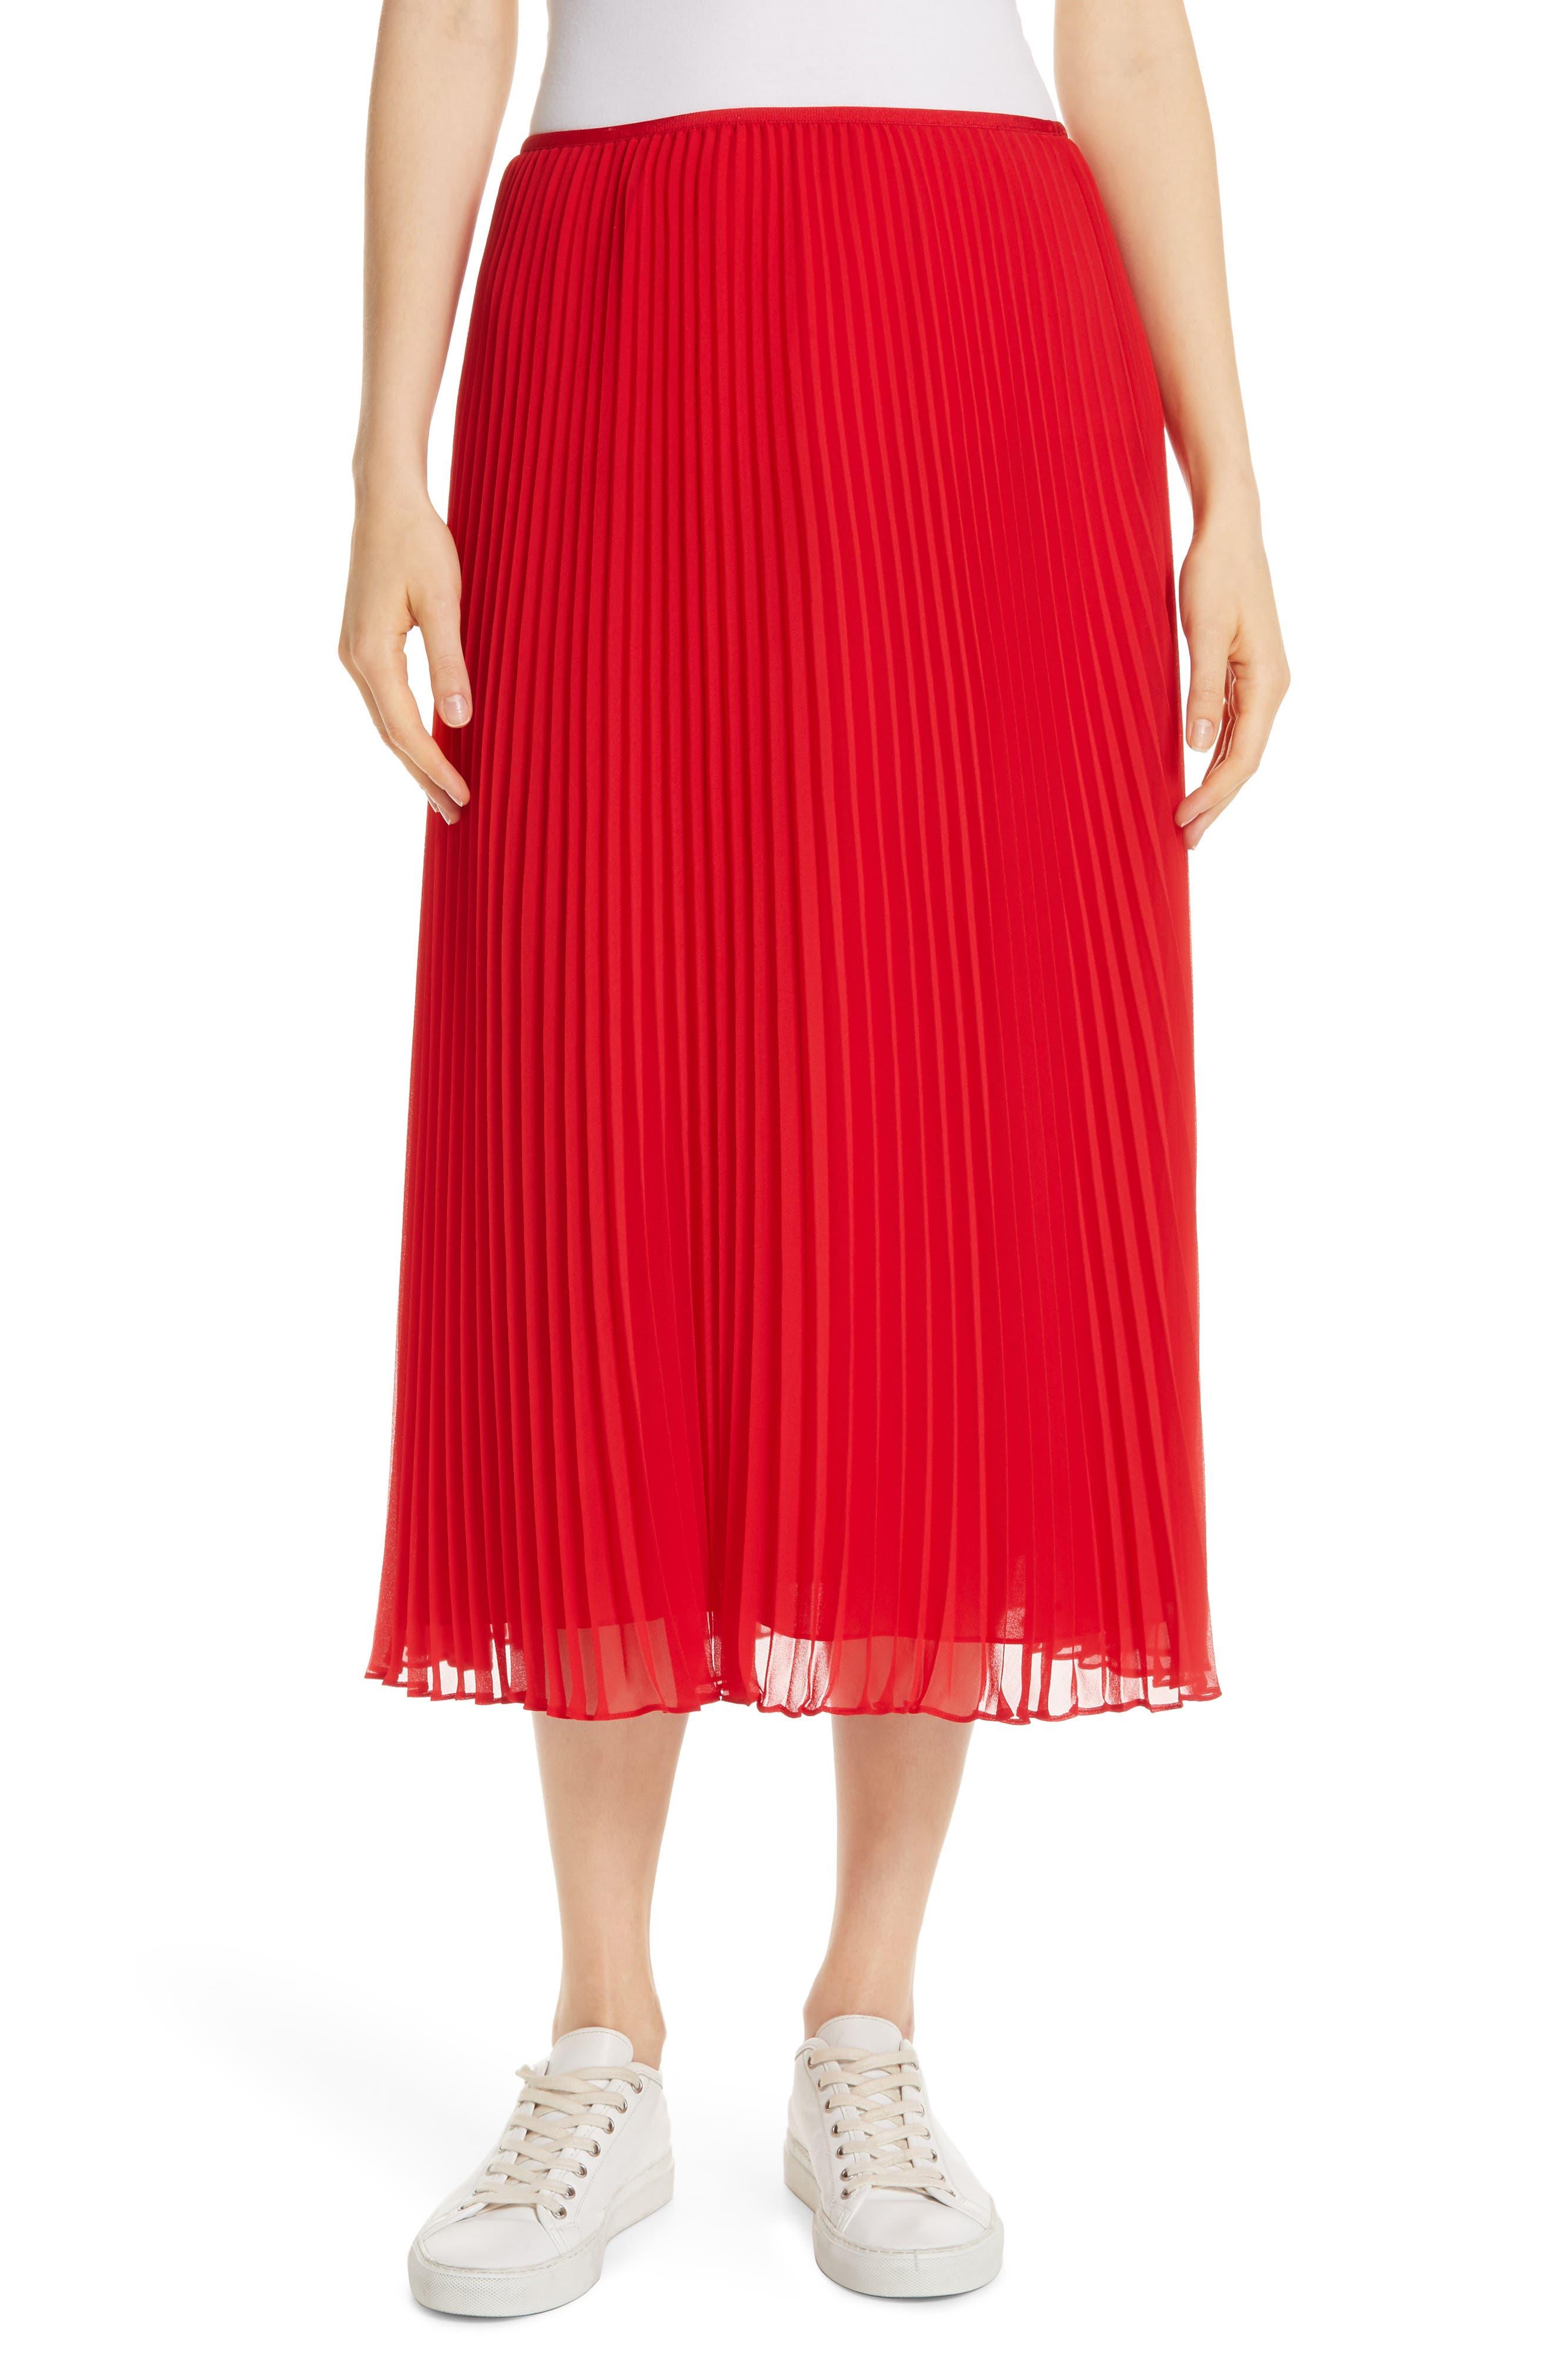 POLO RALPH LAUREN, Pleat Midi Skirt, Main thumbnail 1, color, PANDORA RED